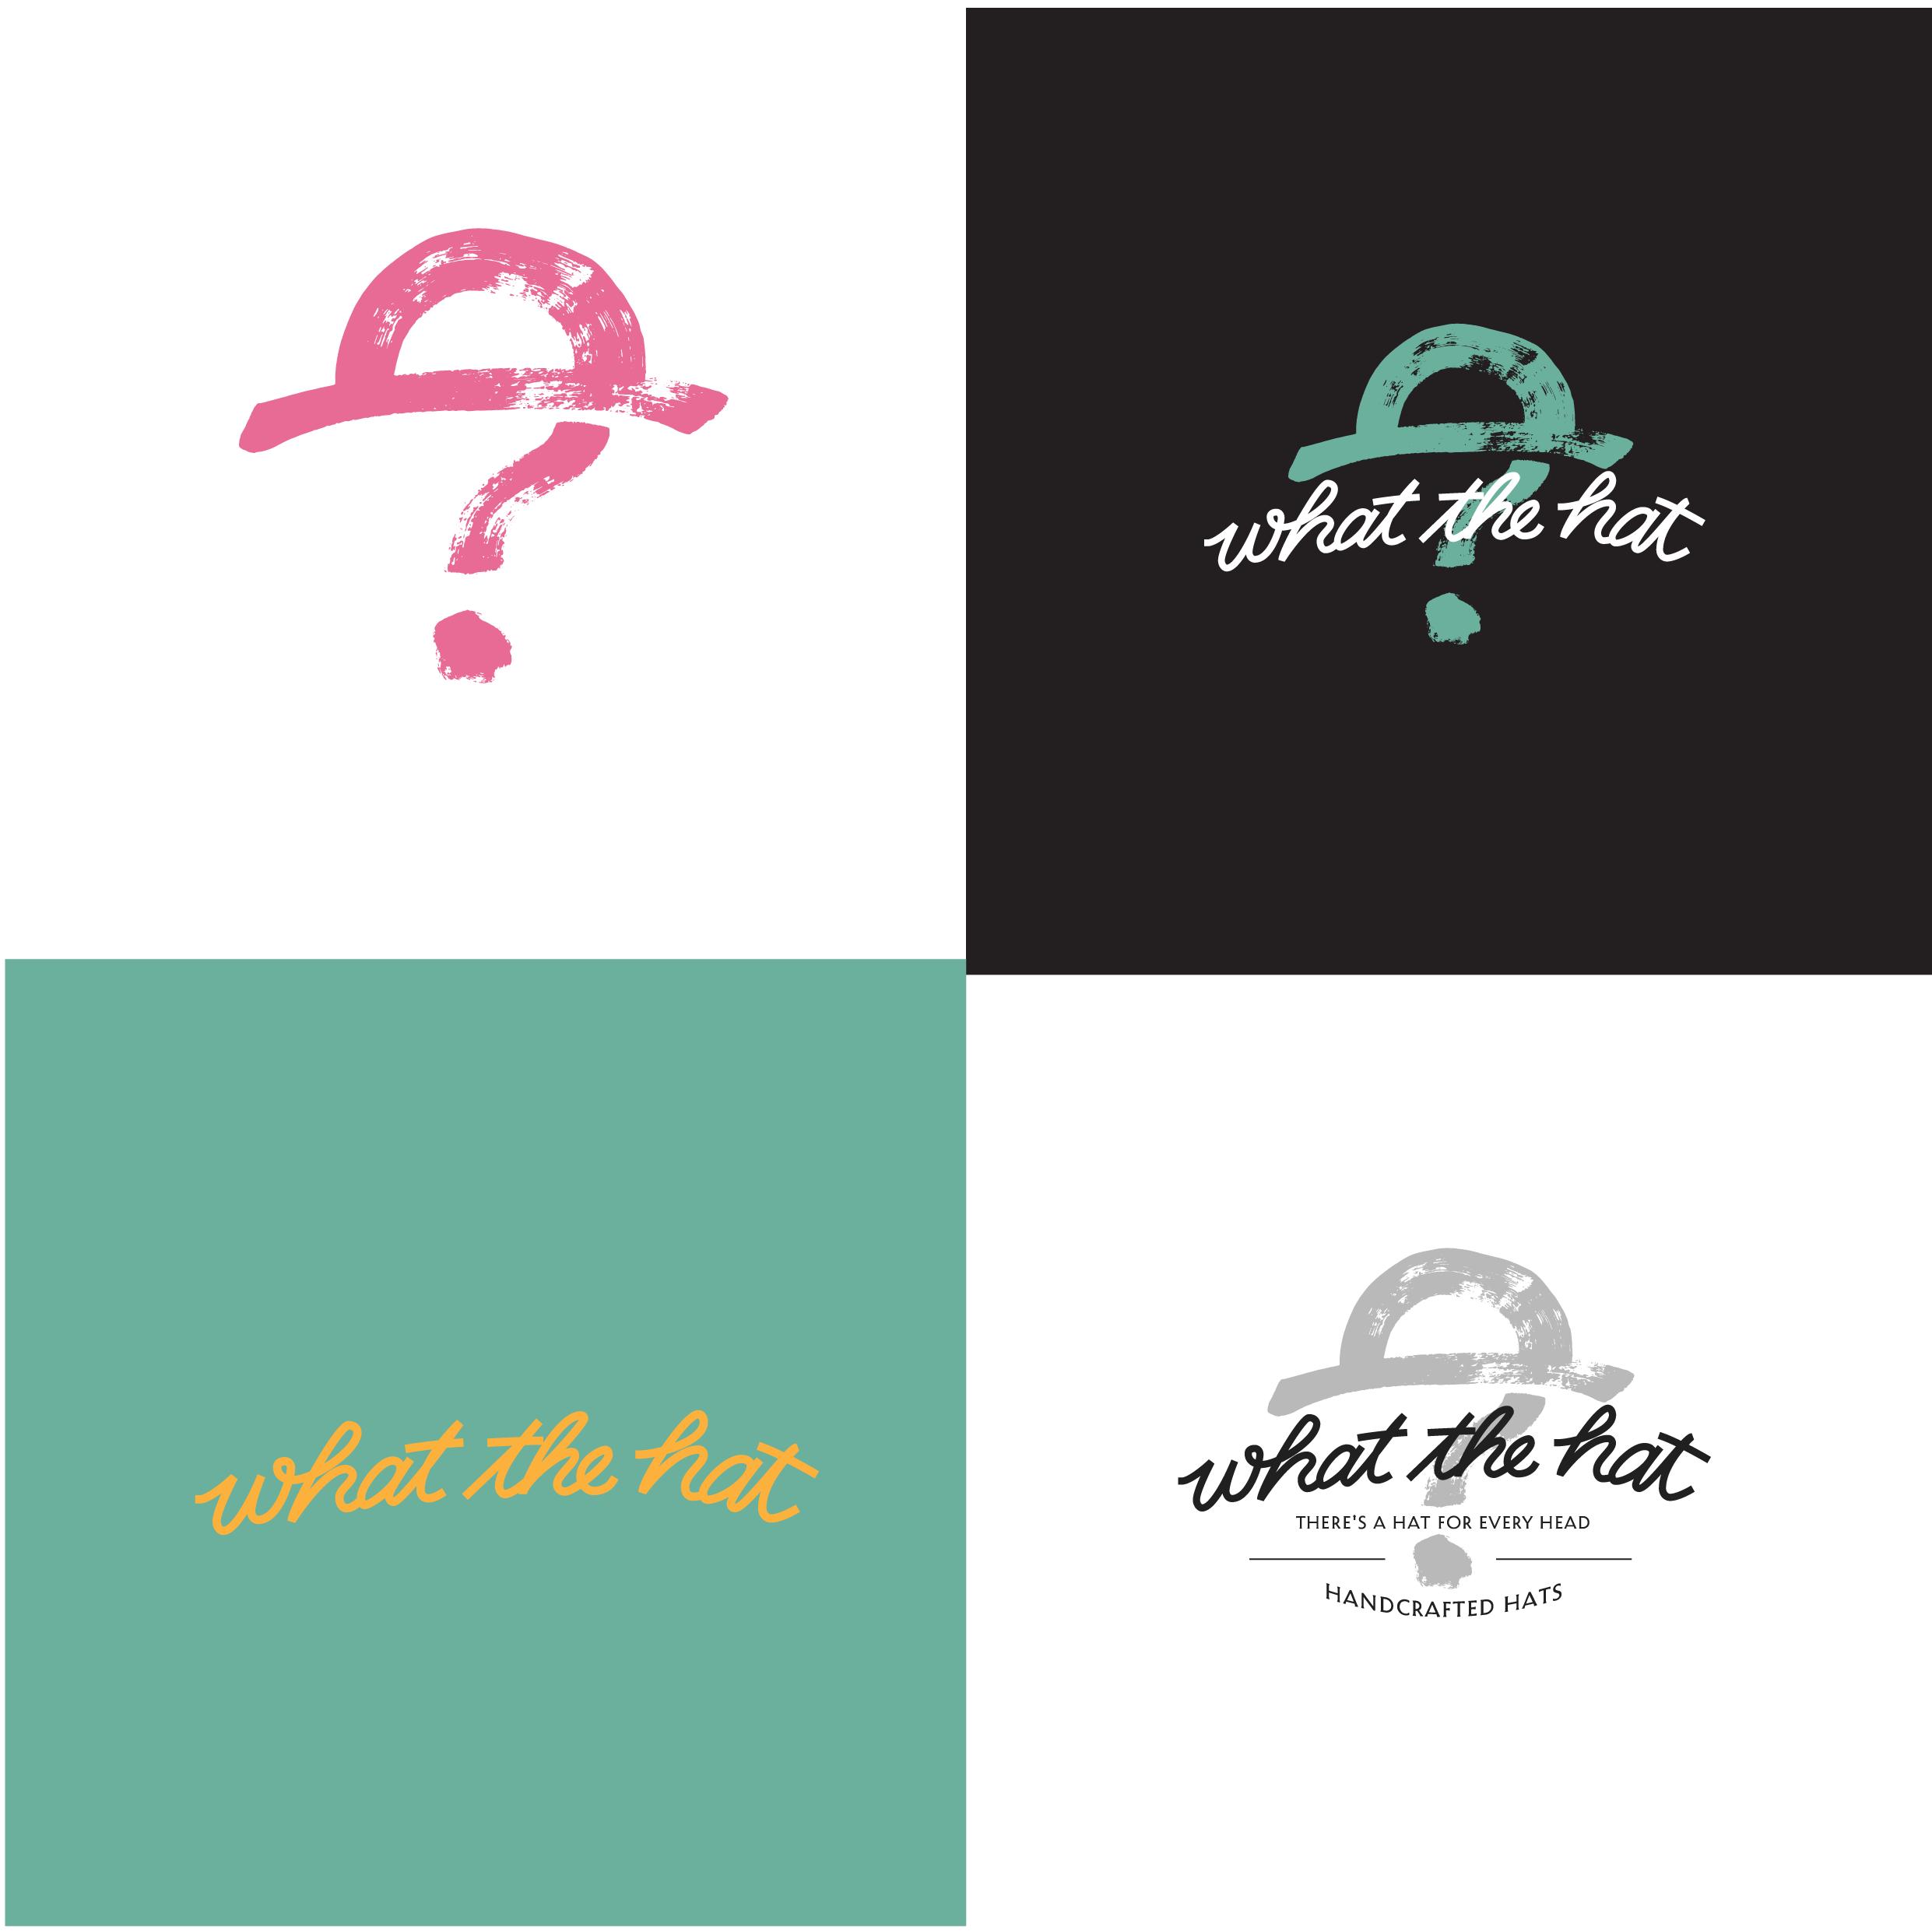 whatthehat-stylebook-insta-06